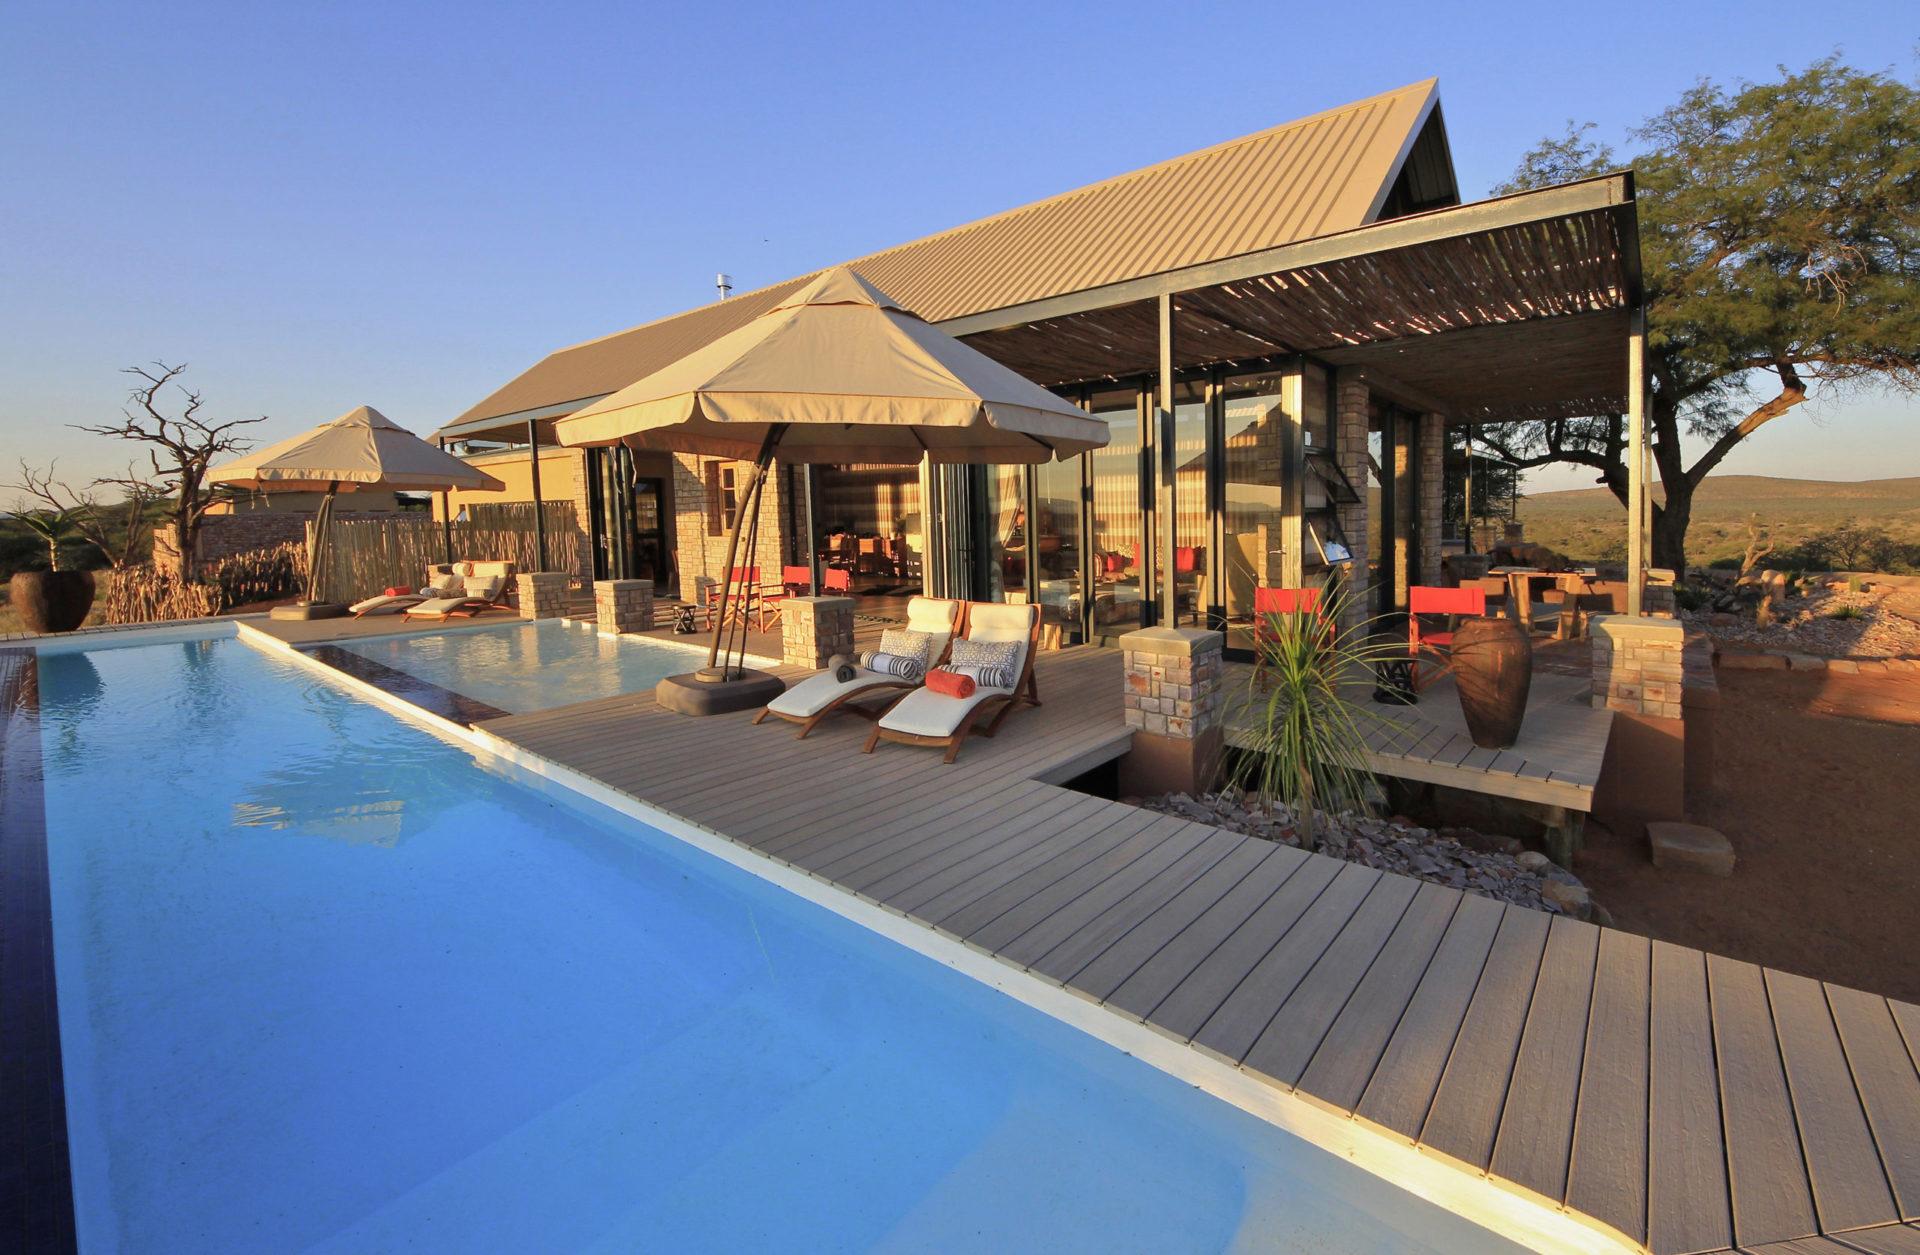 Namibia - 1552 - Otjimbondona - Pool